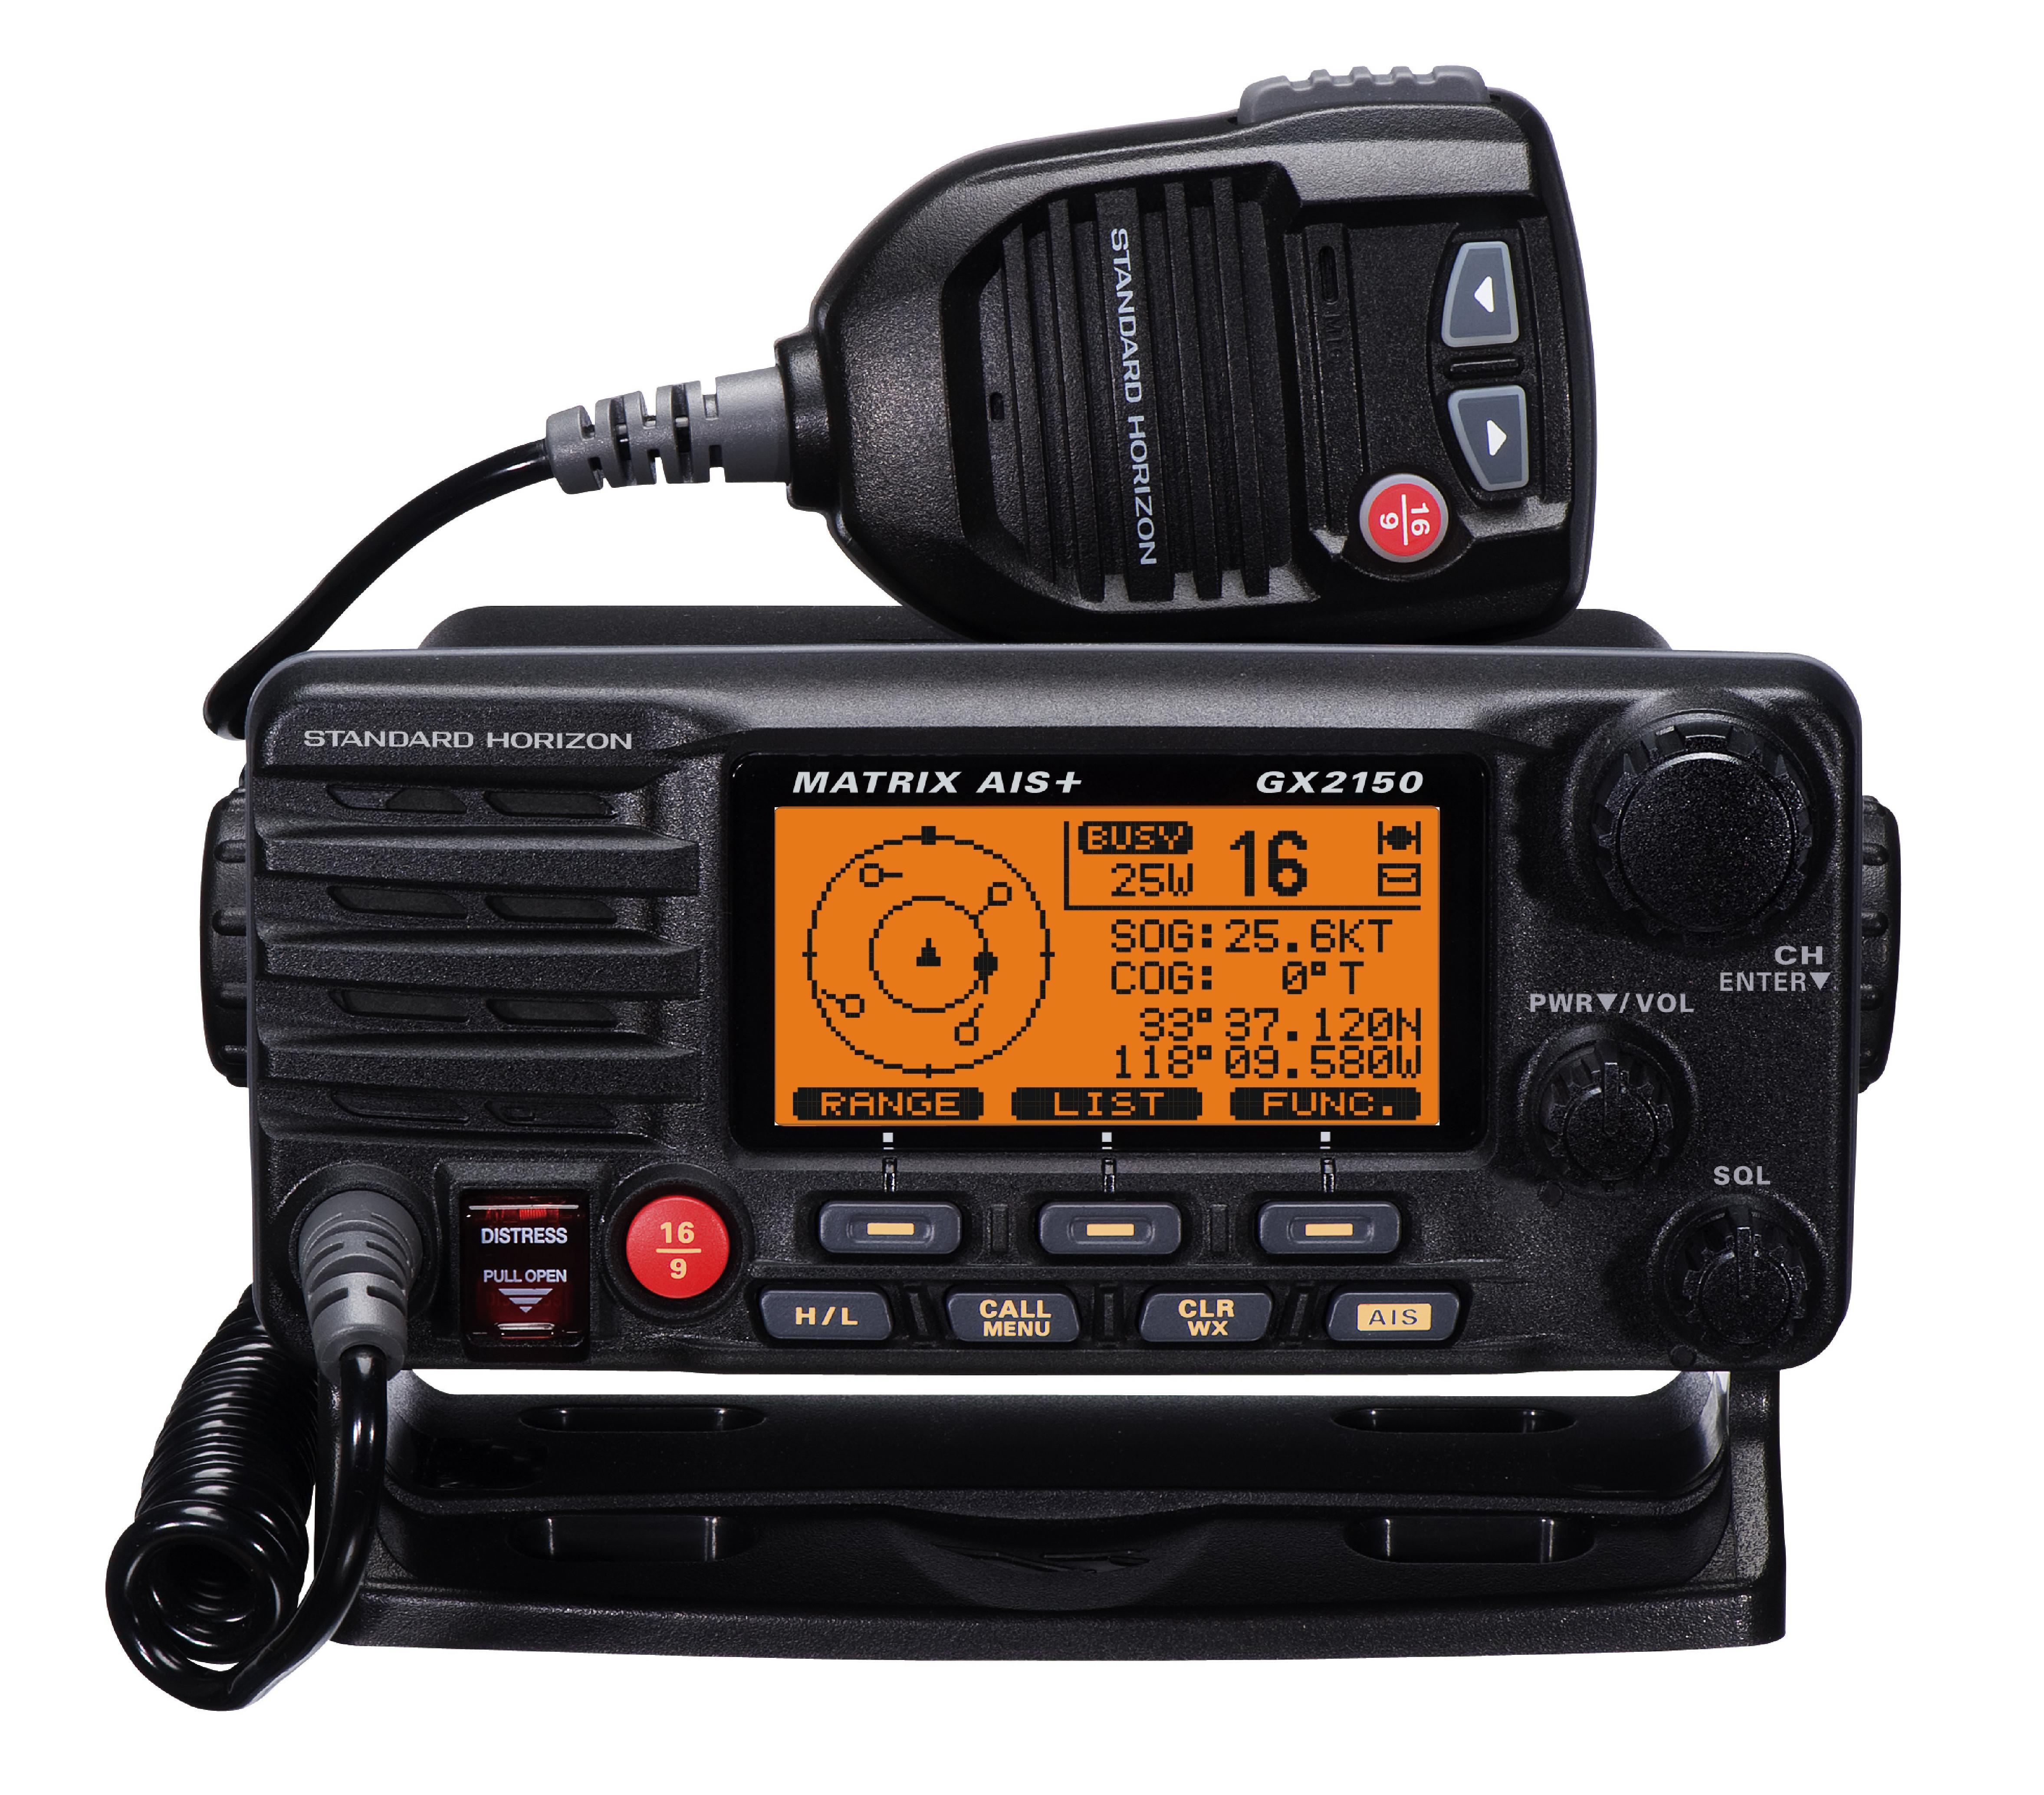 GX2150_ Black_ AIS Compass Display ...